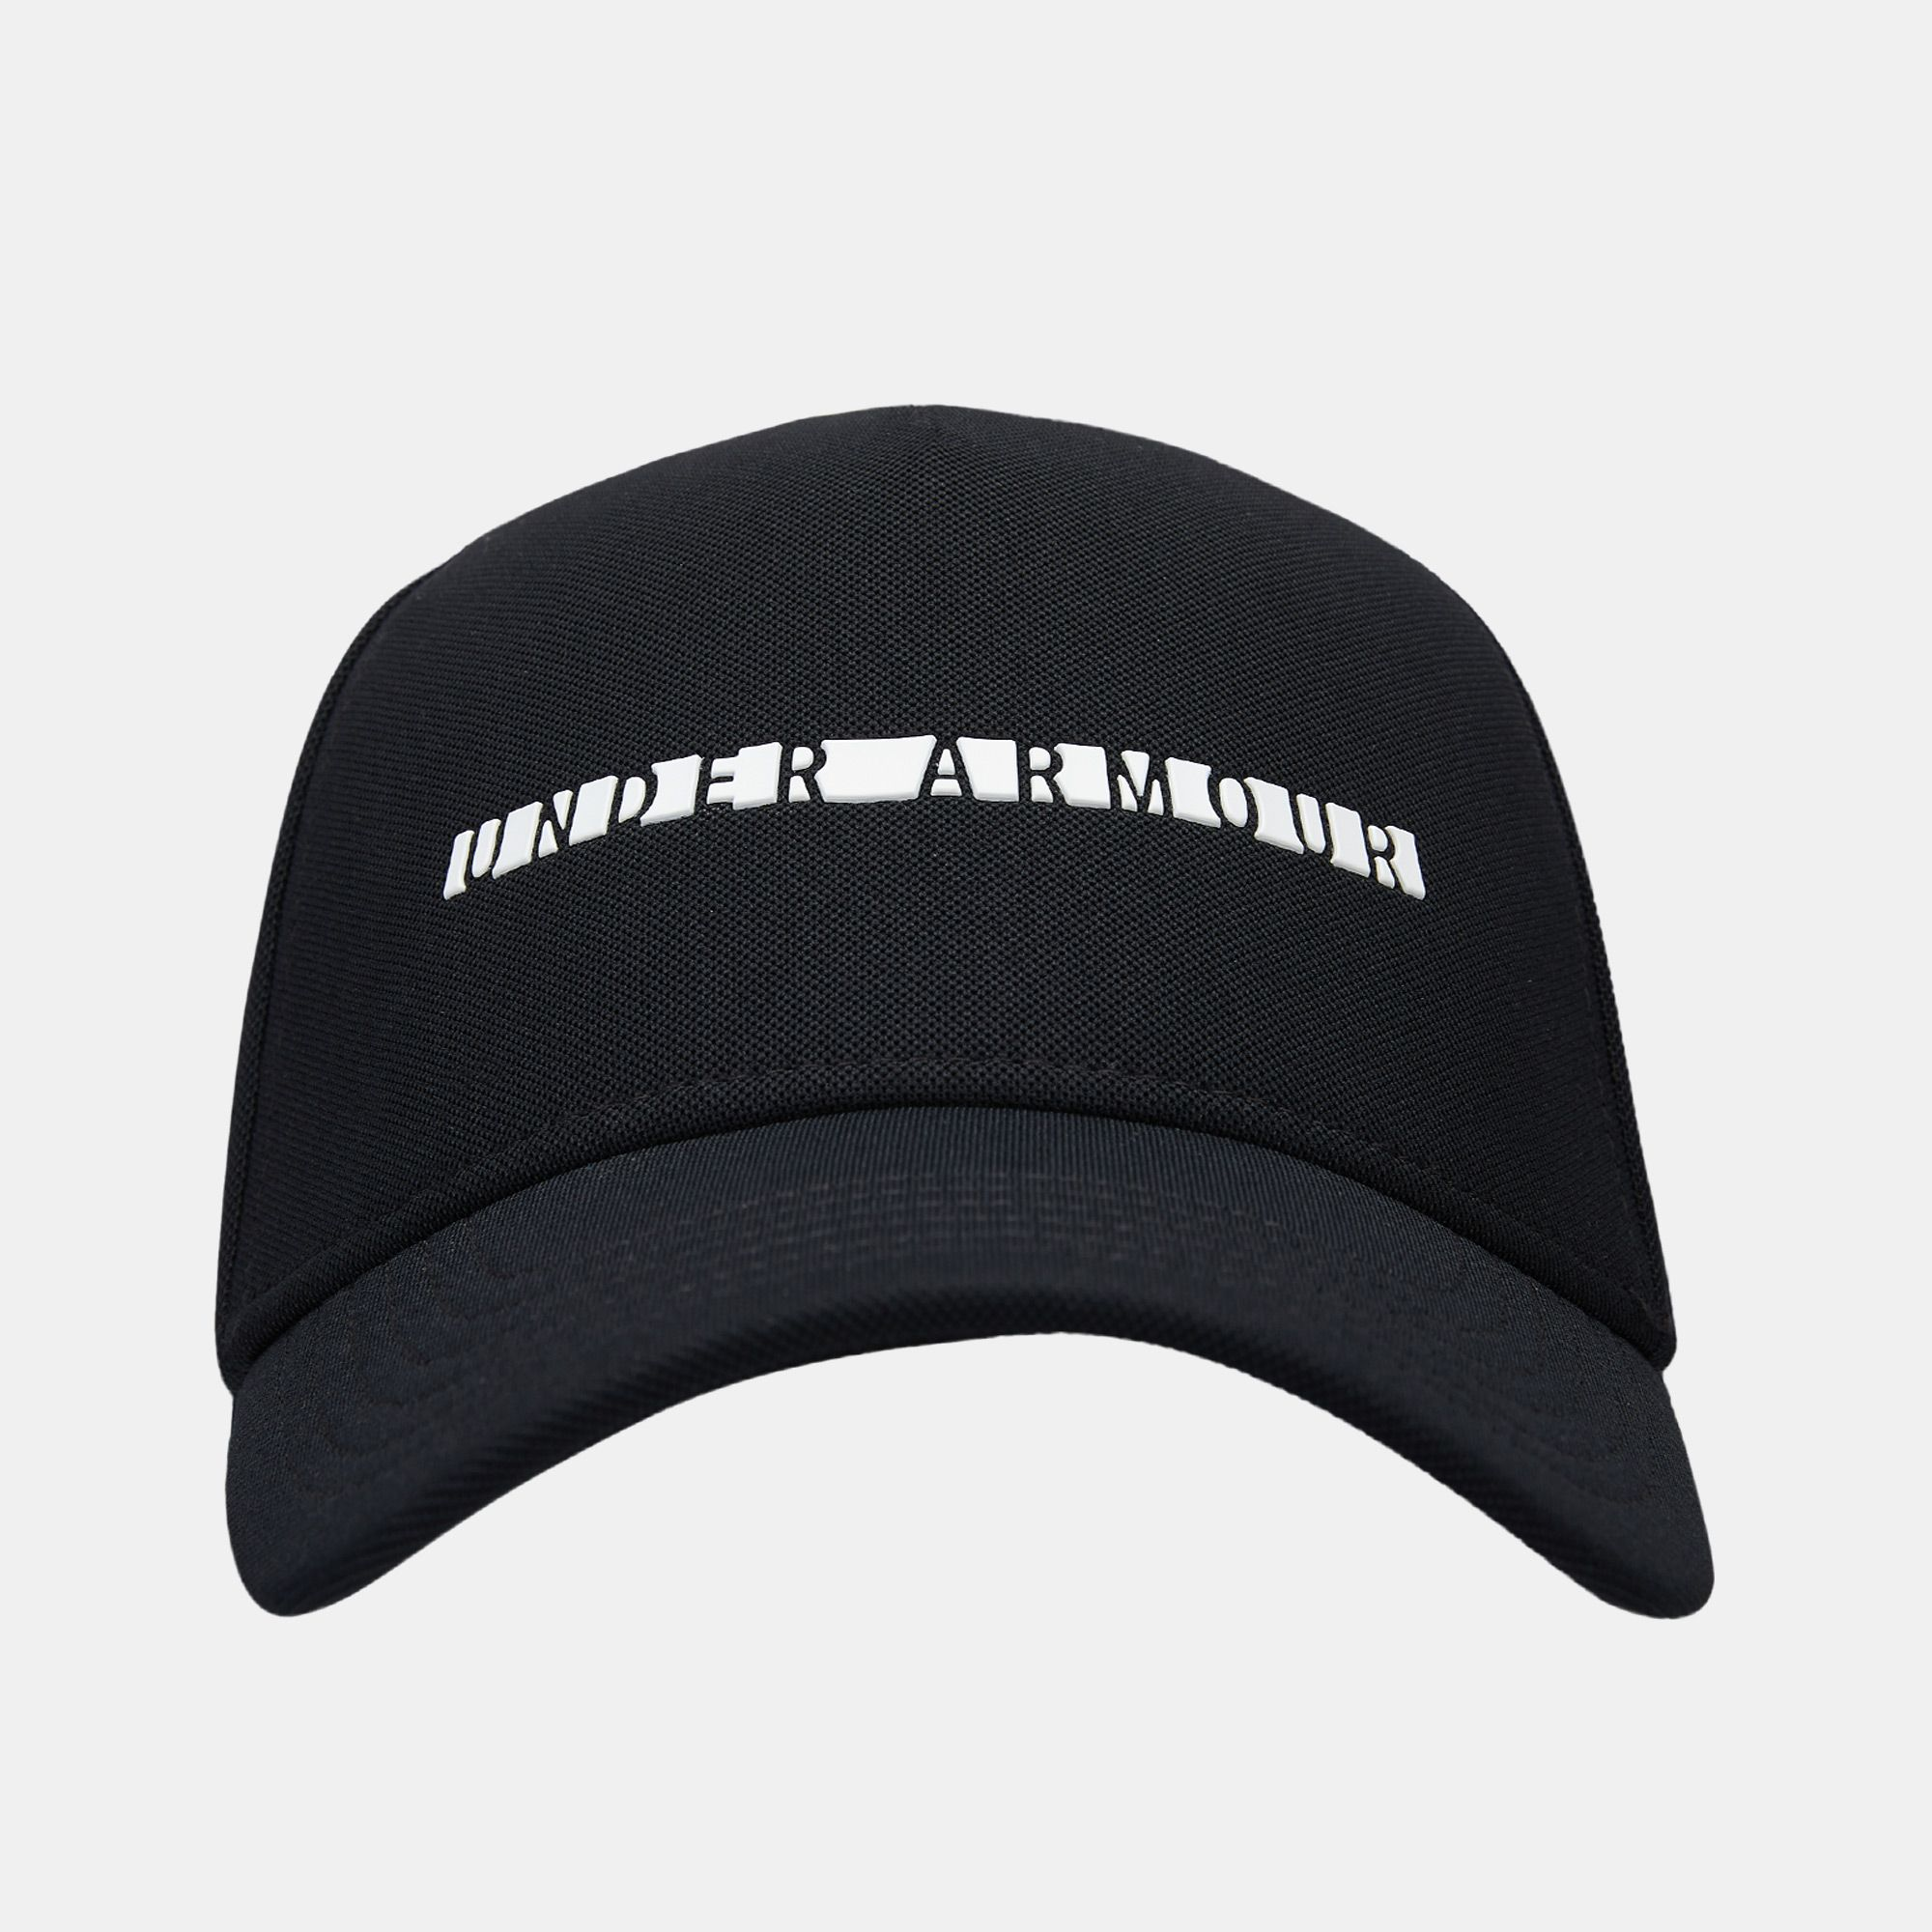 15143906 Under Armour Women's Defiant Cap | Caps | Caps and Hats ...